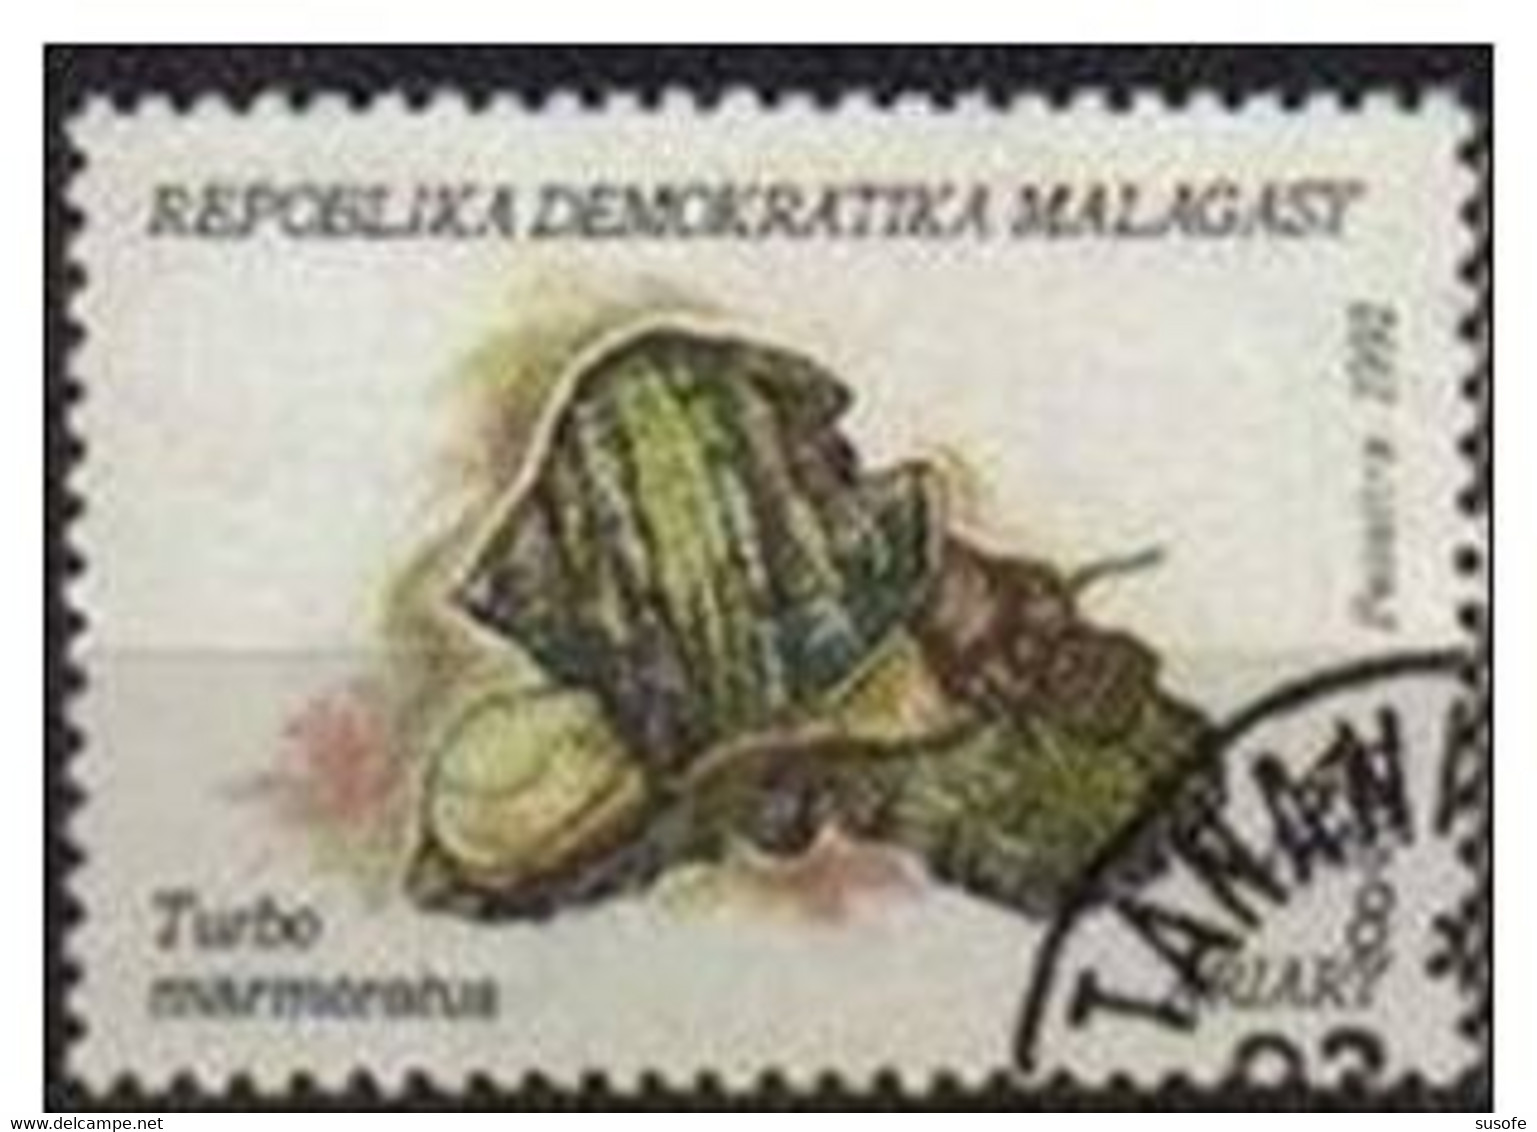 Madagascar 1992 Scott 1122 Sello * Moluscos Turbo Marmoratus 8A Michel 1416 Malagasy Madagascar Stamps Timbre Briefmarke - Madagascar (1960-...)